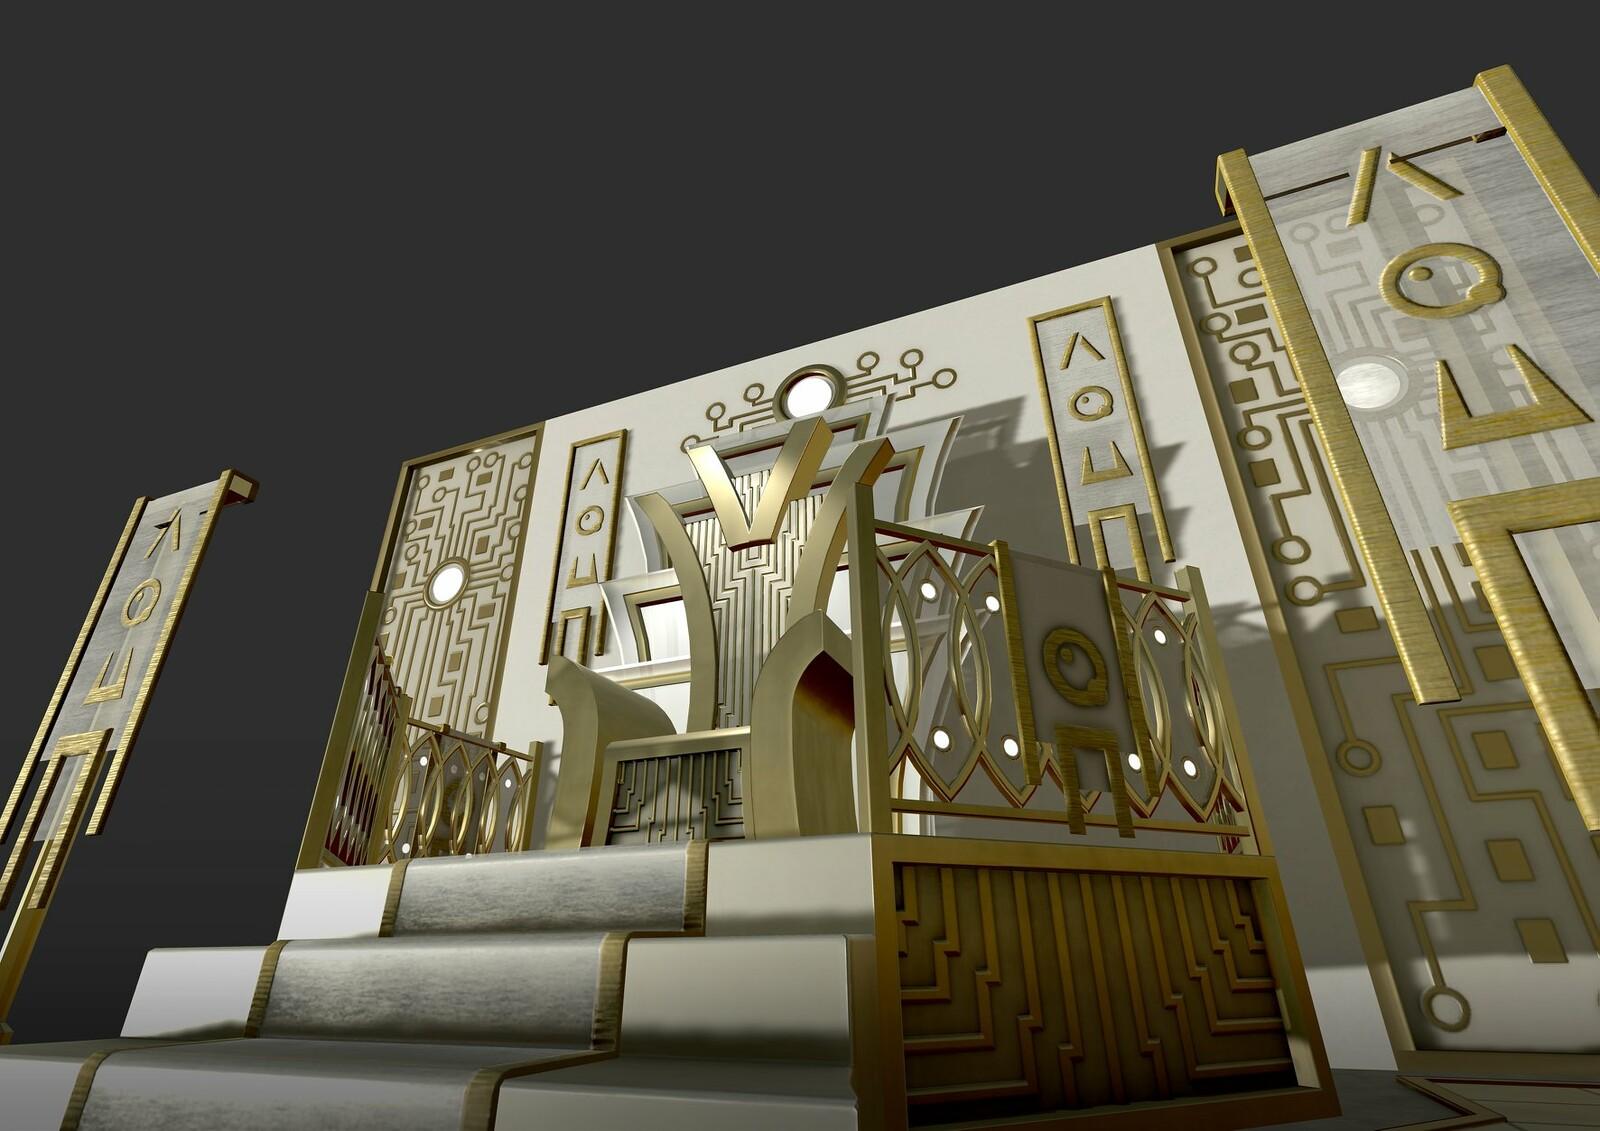 Futuristic throne room. Unity screenshot.